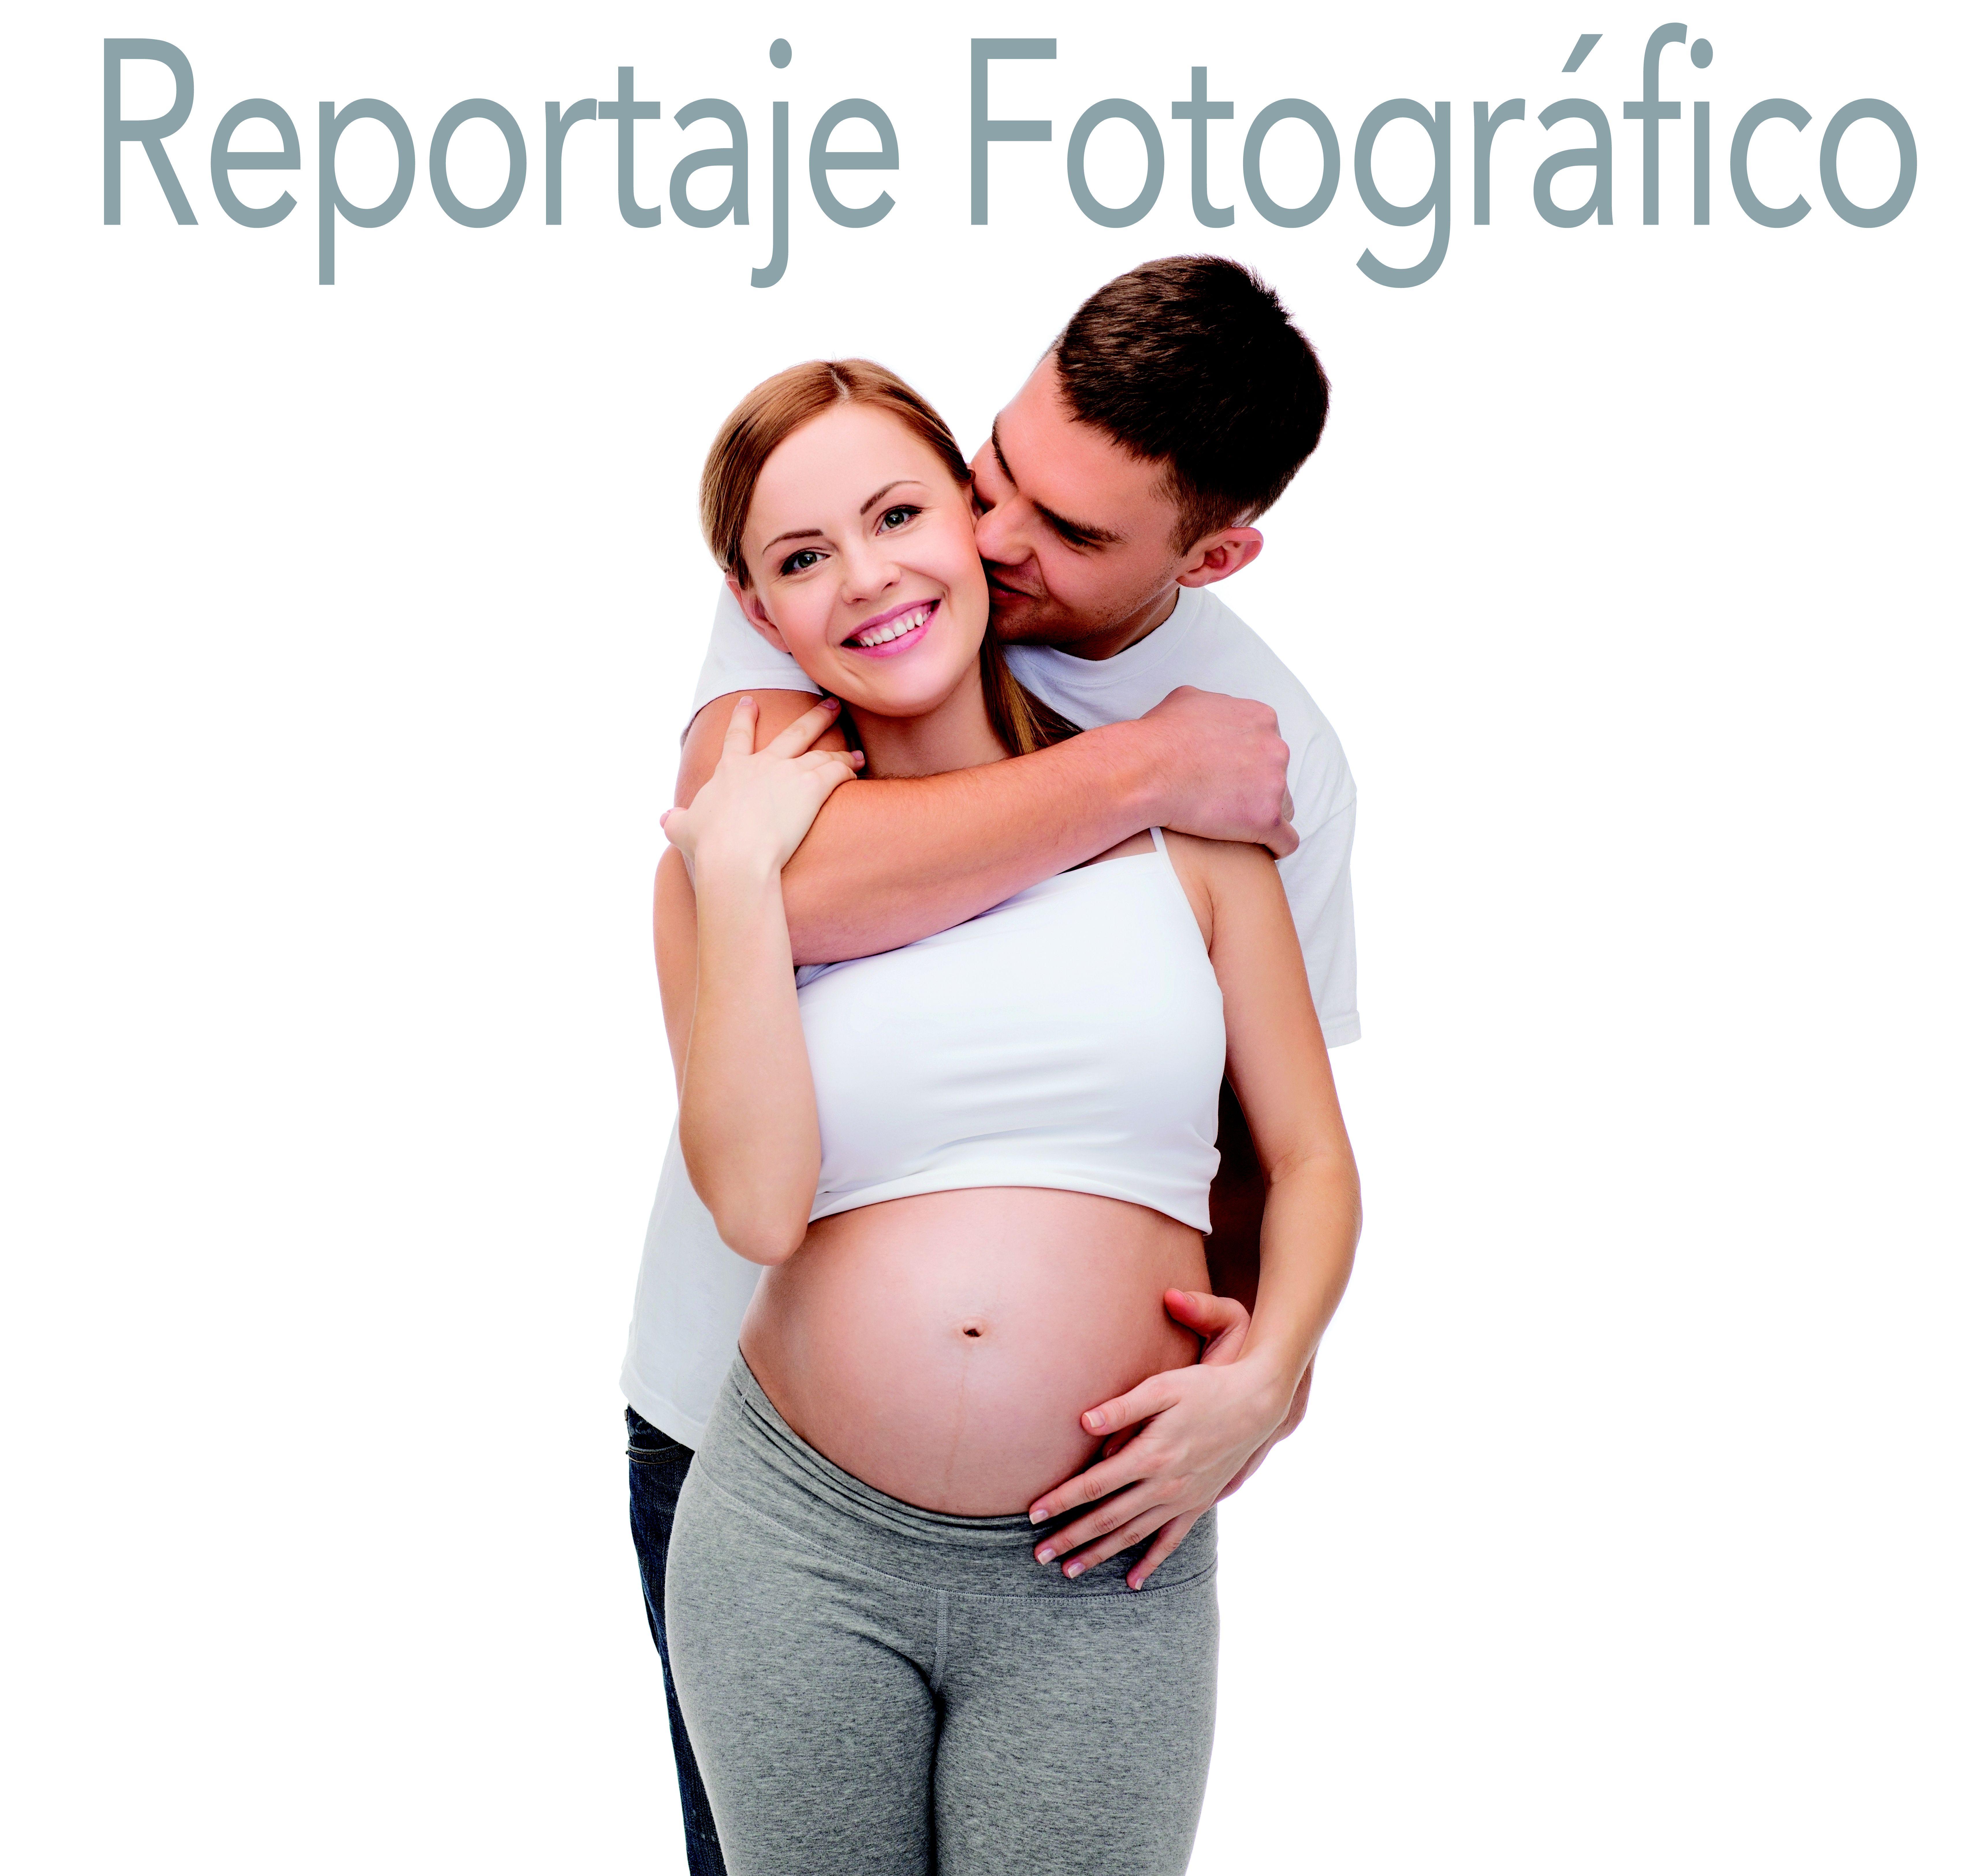 Reportaje fotográfico